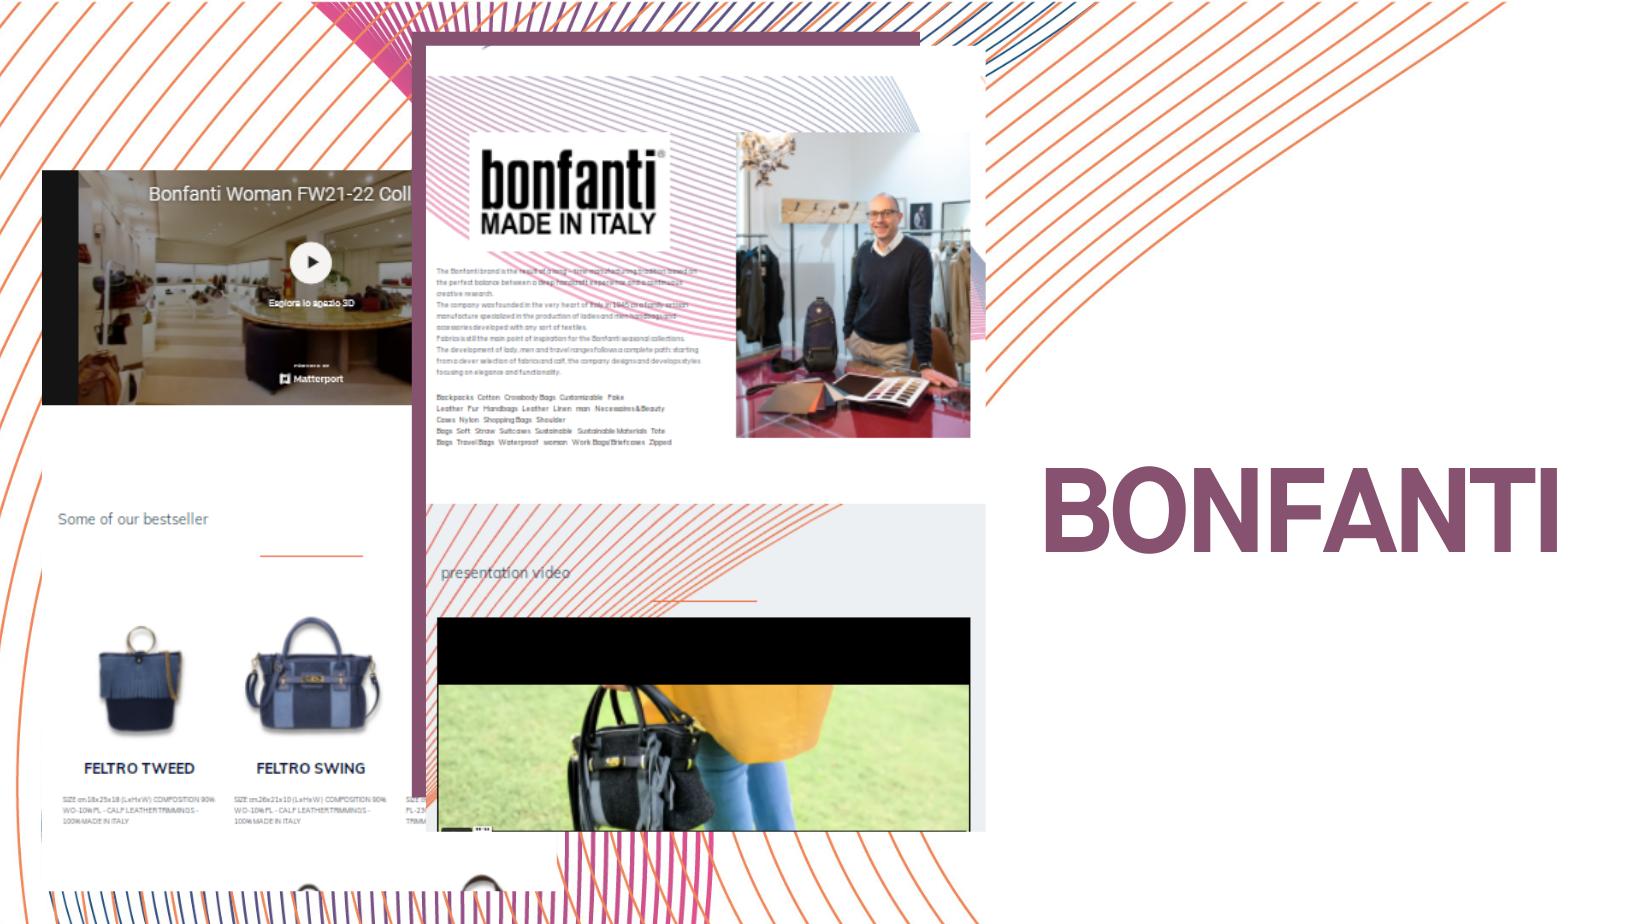 BONFANTI- mipelthedigitalshow.com